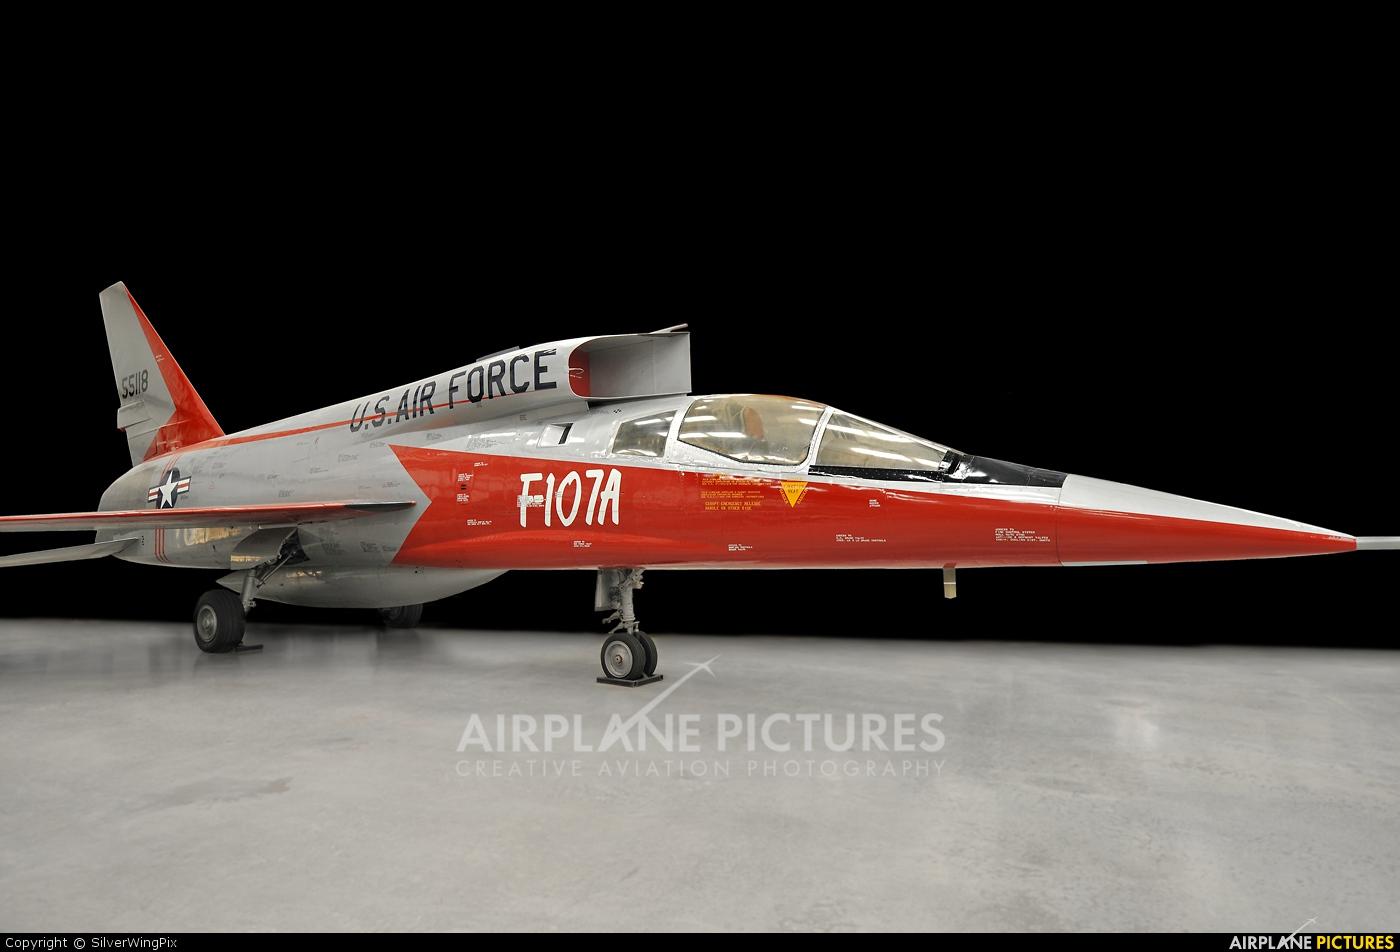 USA - Air Force 55-5118 aircraft at Tucson - Pima Air & Space Museum